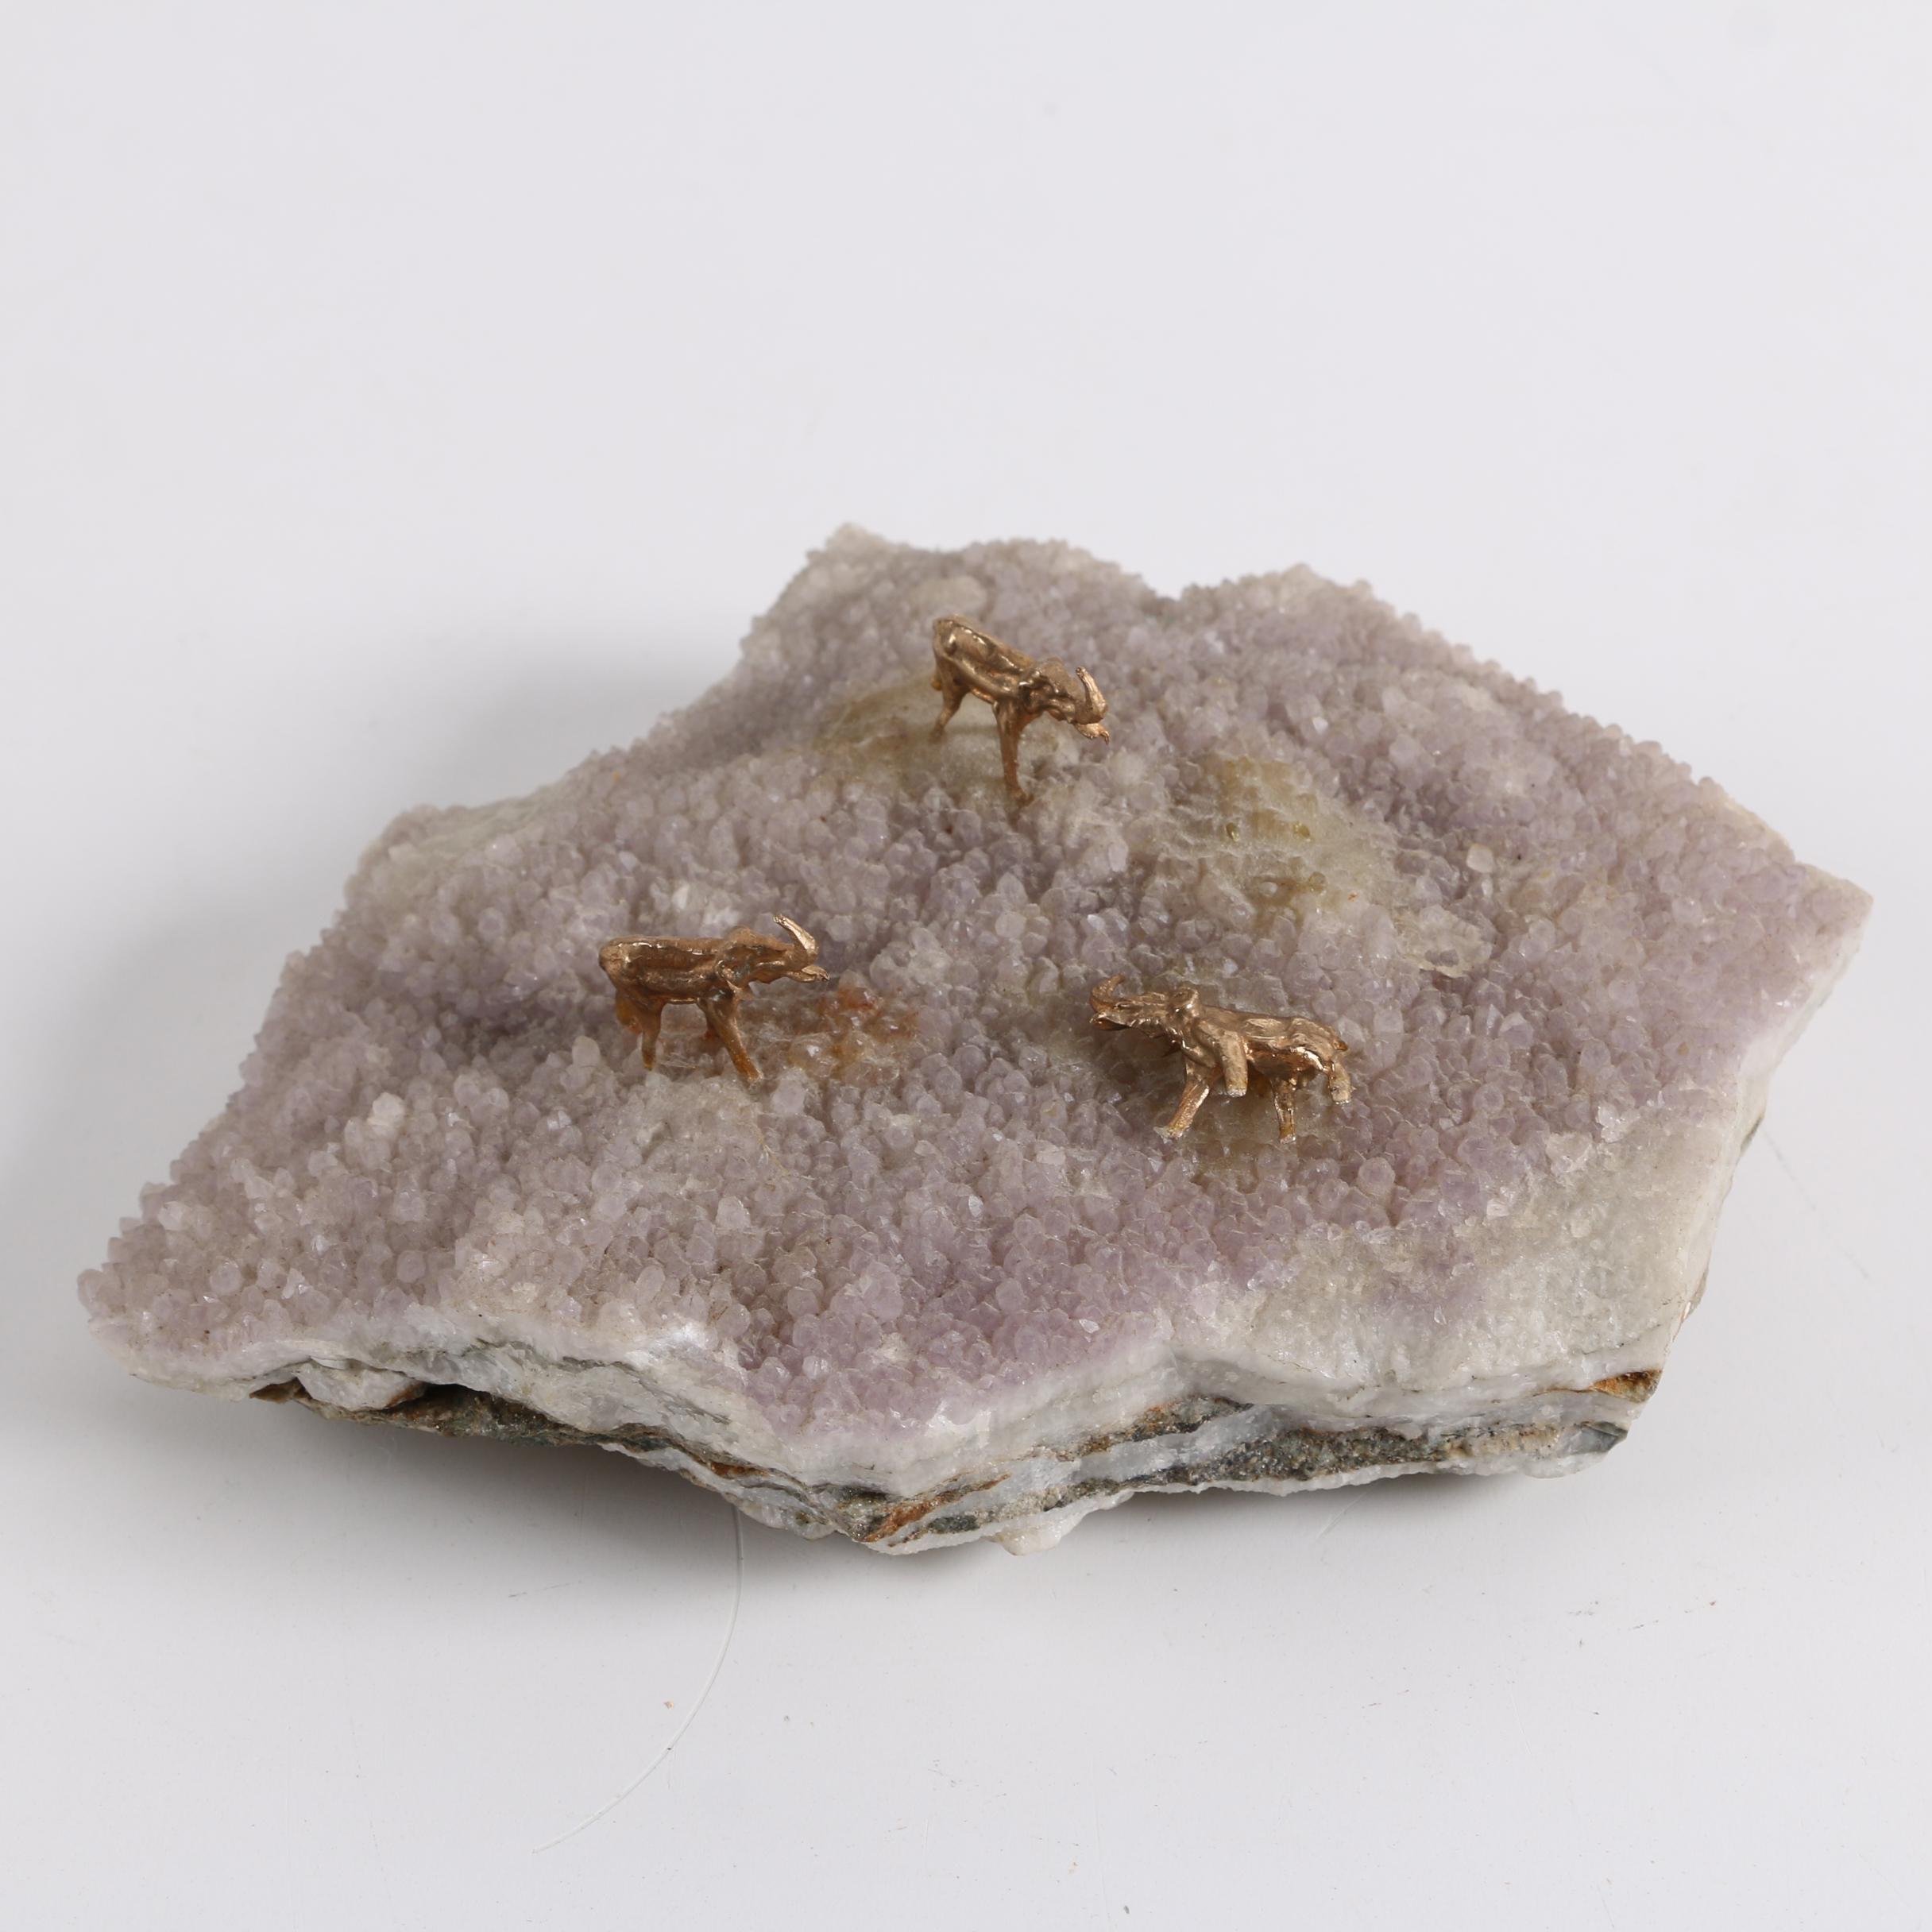 Crystal Geode with Metal Elephants